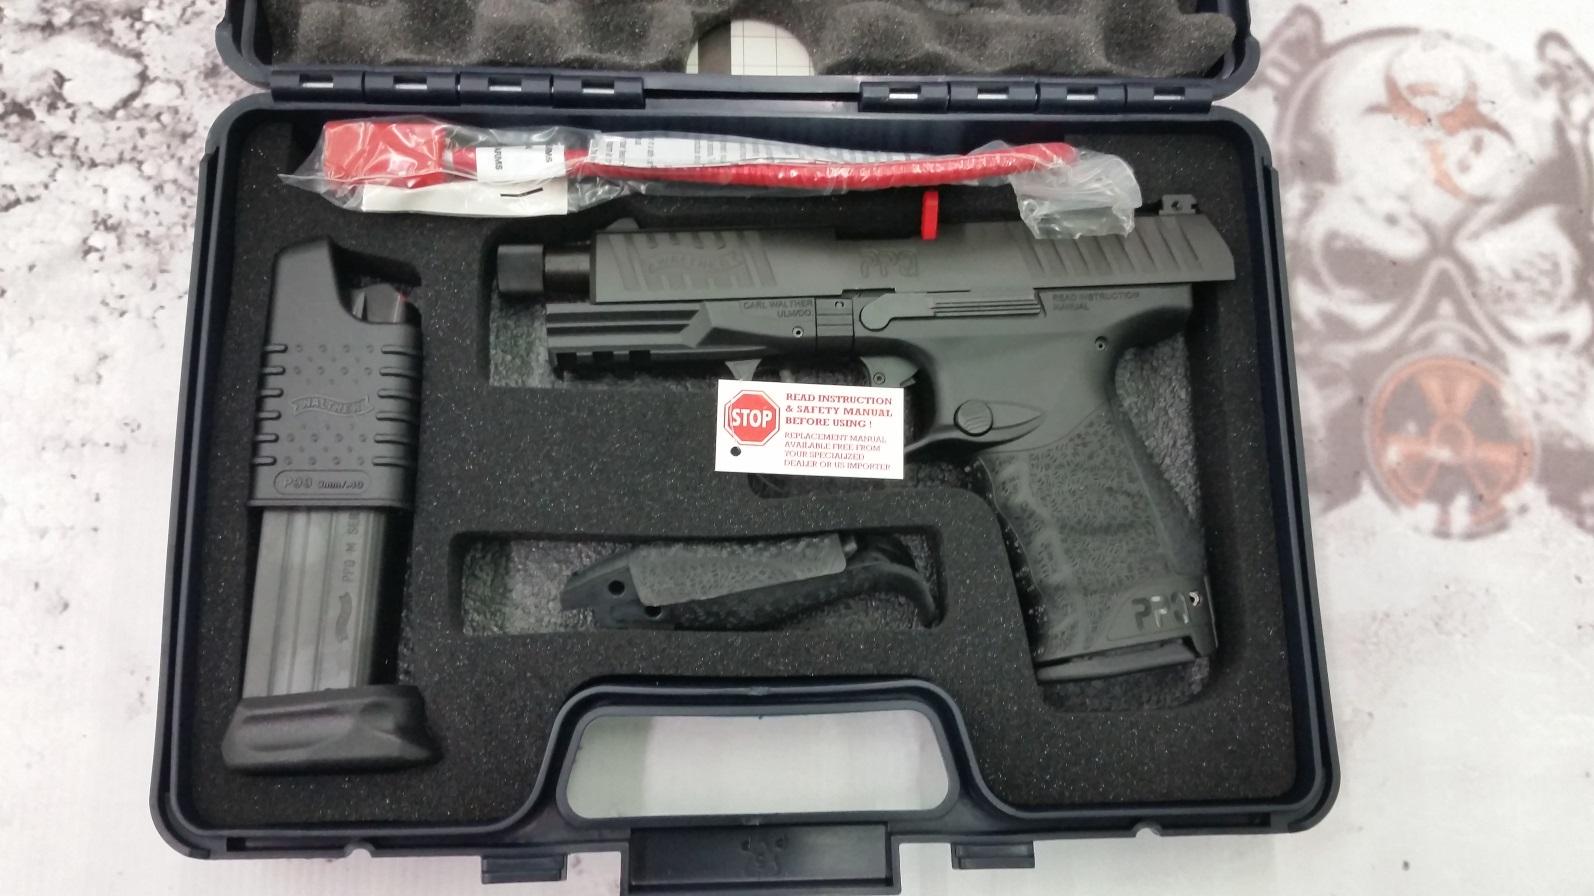 Walther PPQ M2 Navy Pistol 2796082 9mm - 4 6'' THREADED BARREL, Polymer  Grip, Black Finish, 15 & 17 Rd mags